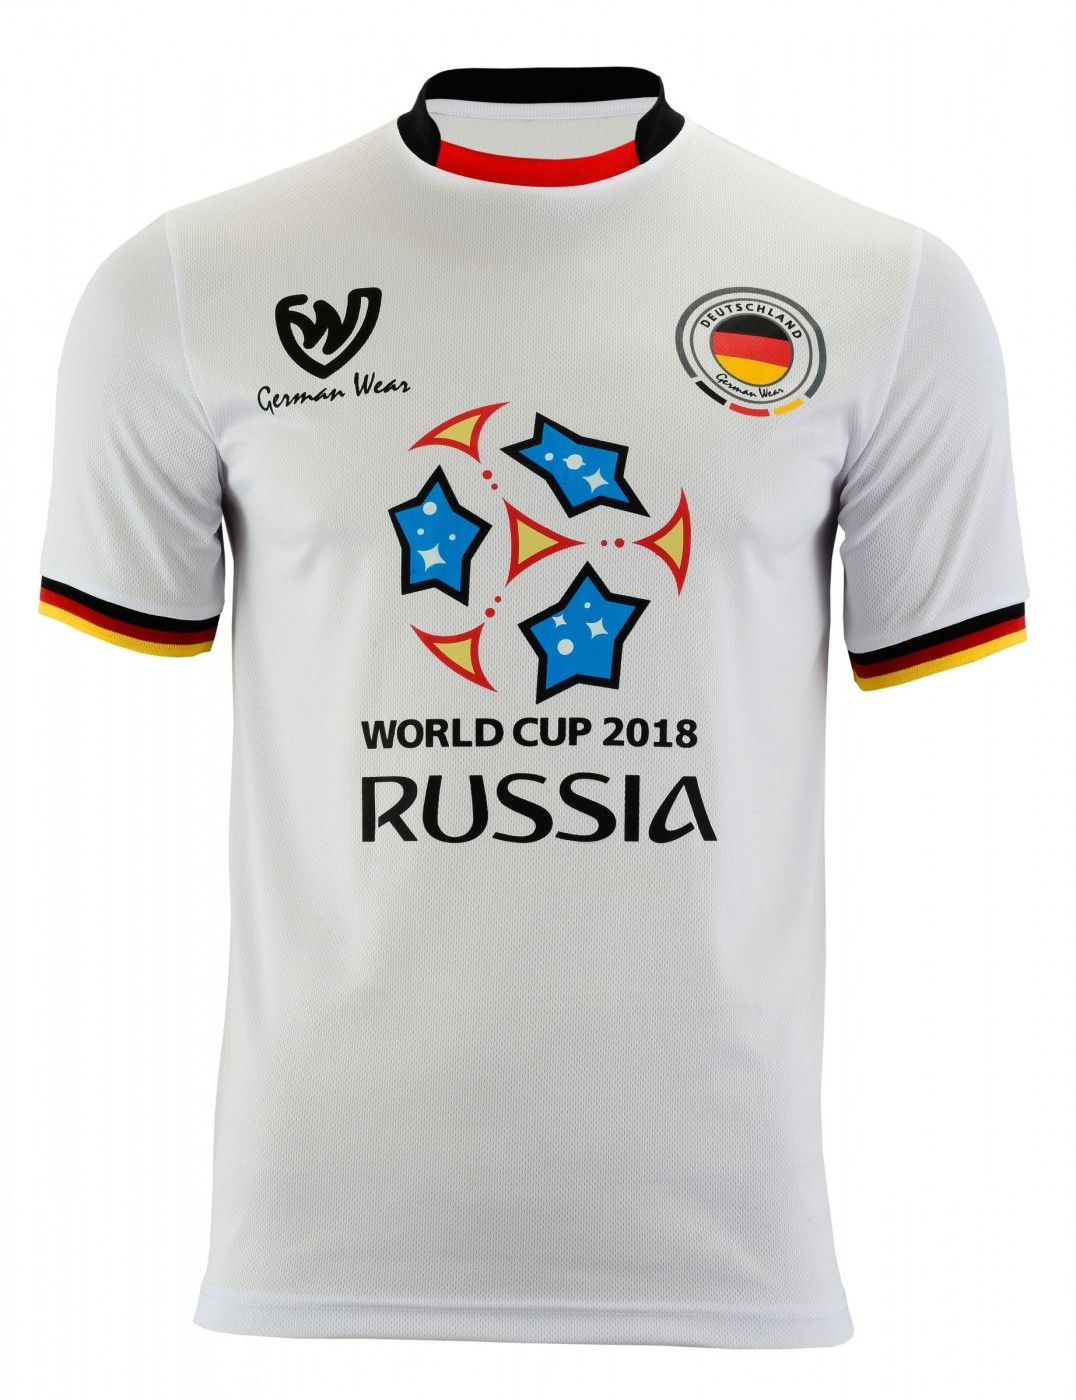 Fussball Trikots Deutschland Wm 2018 Marco Reus 11 Heimtrikot Kurzarm Fussball Trikot Deutschland Deutschland Trikot Deutschland Wm